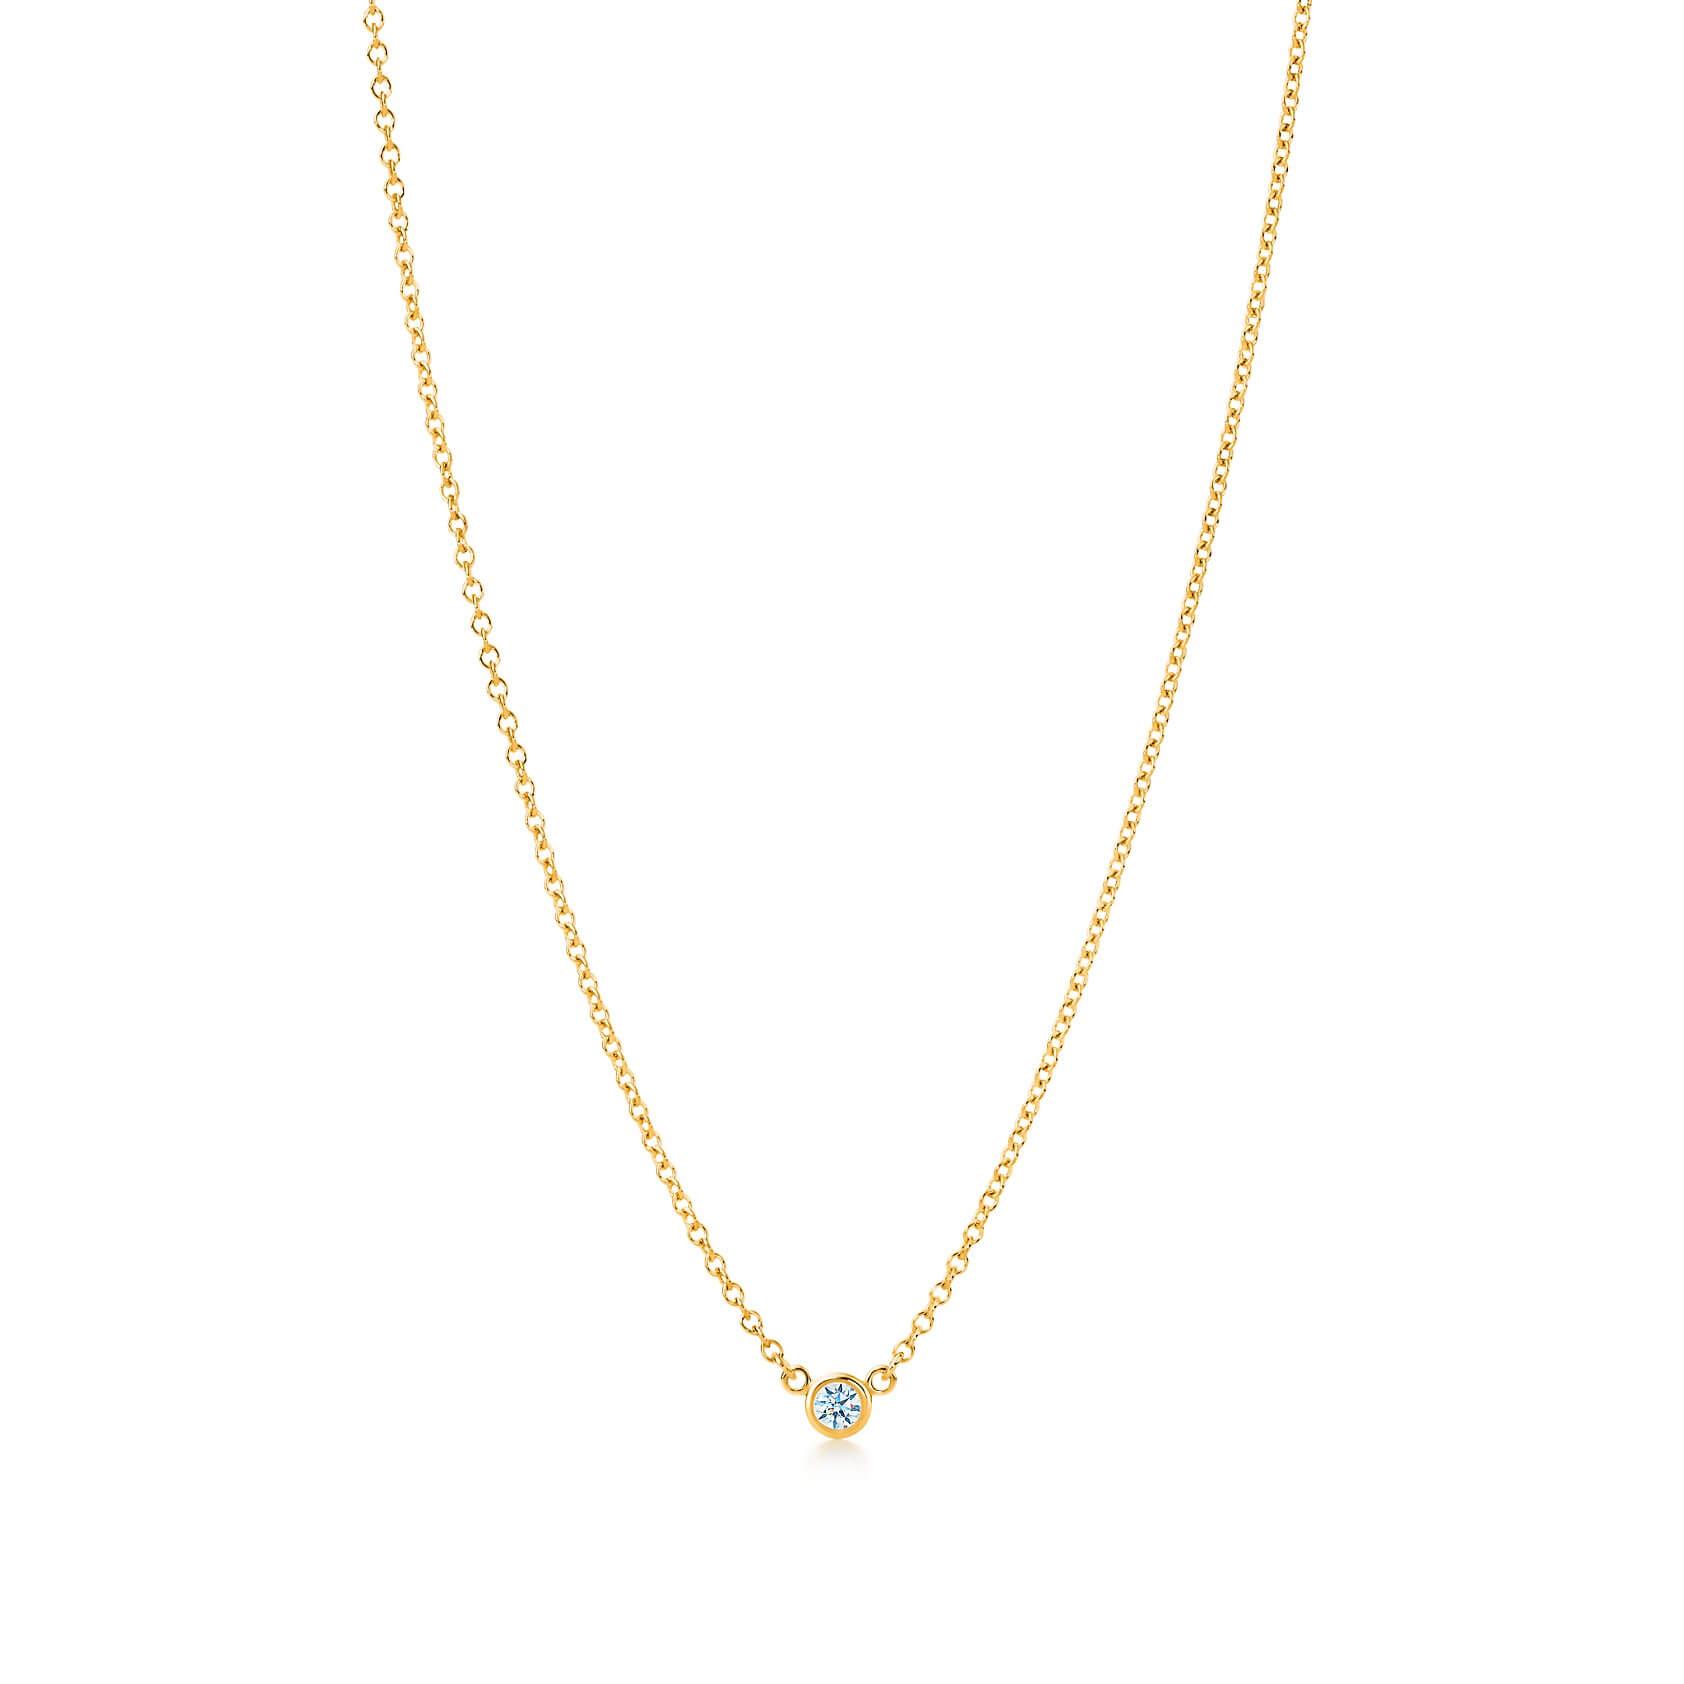 Tiffany & Co_ダイヤモンド バイ ザ ヤード ペンダント_商品写真